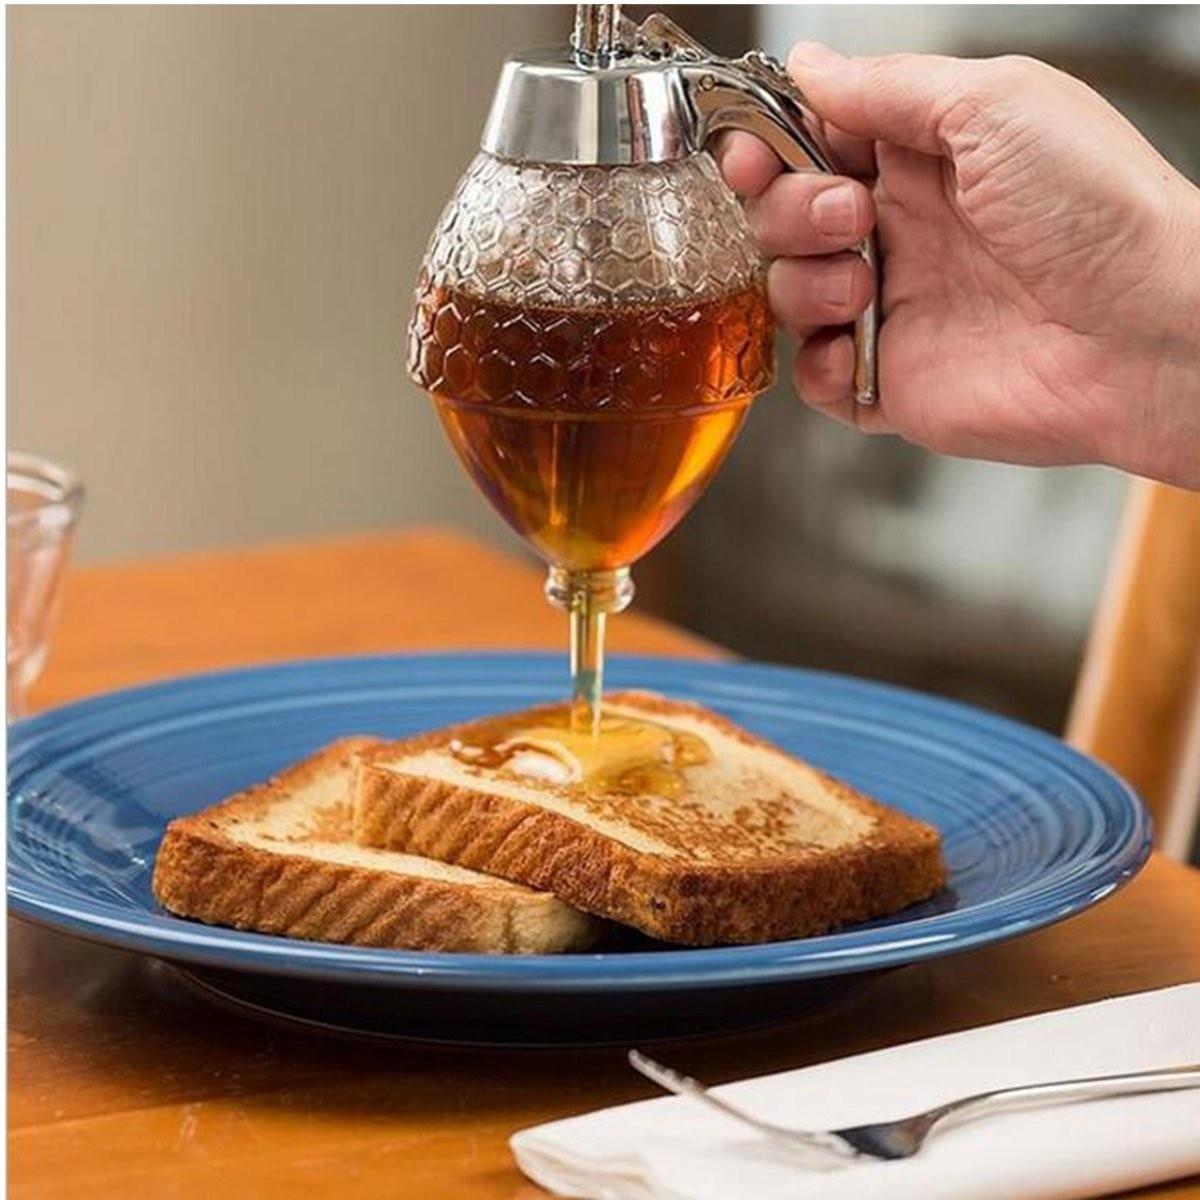 200ML <font><b>Honey</b></font> Dispenser Jar Container <font><b>Cup</b></font> Portable Acrylic Storage Pot Juice Bee Drip Bottle Cooking Tool Craft